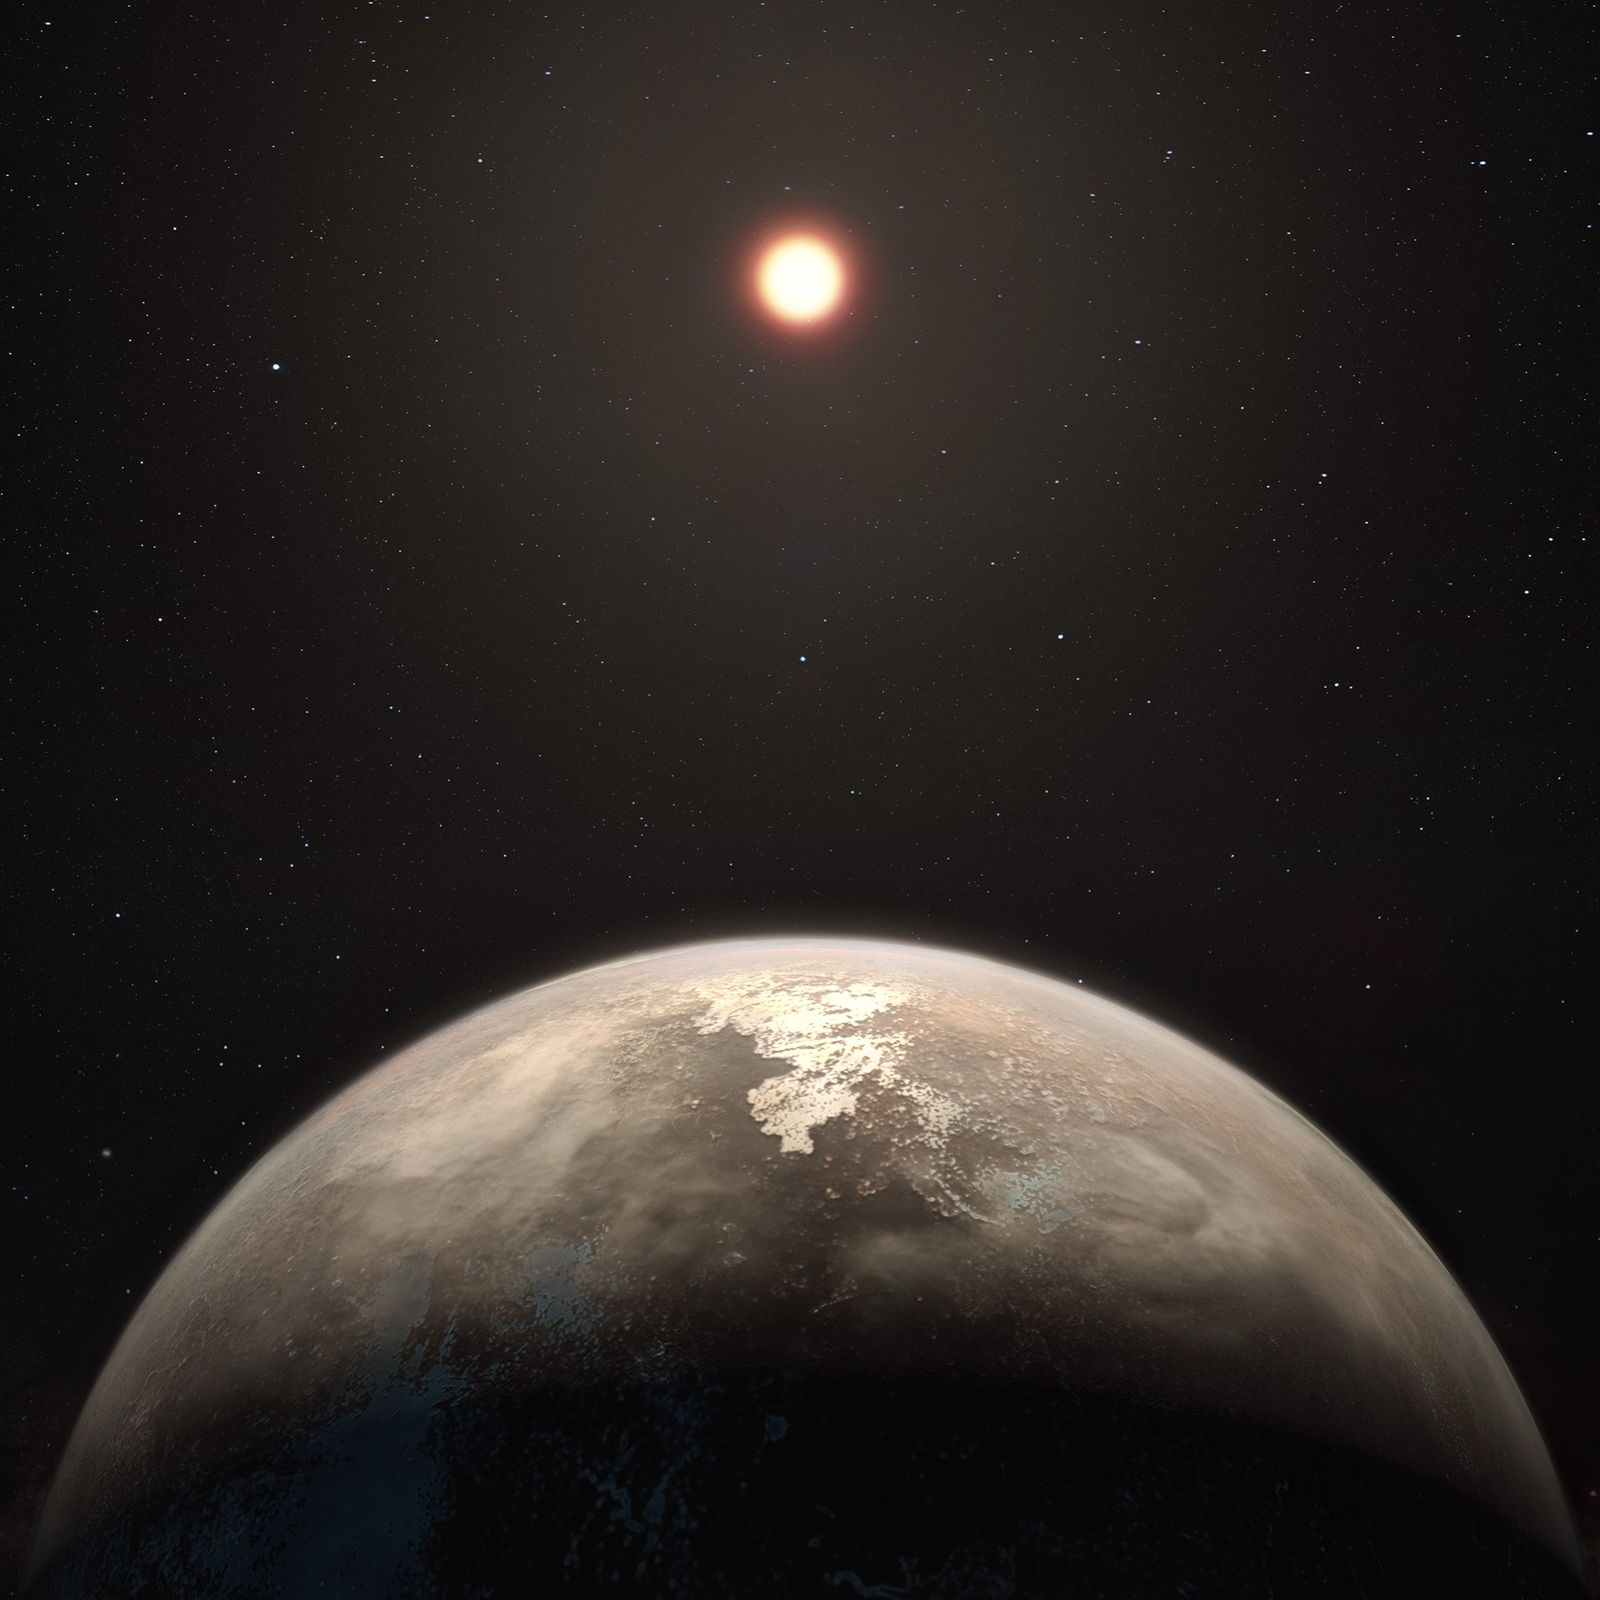 novo-planeta-ross-128-b